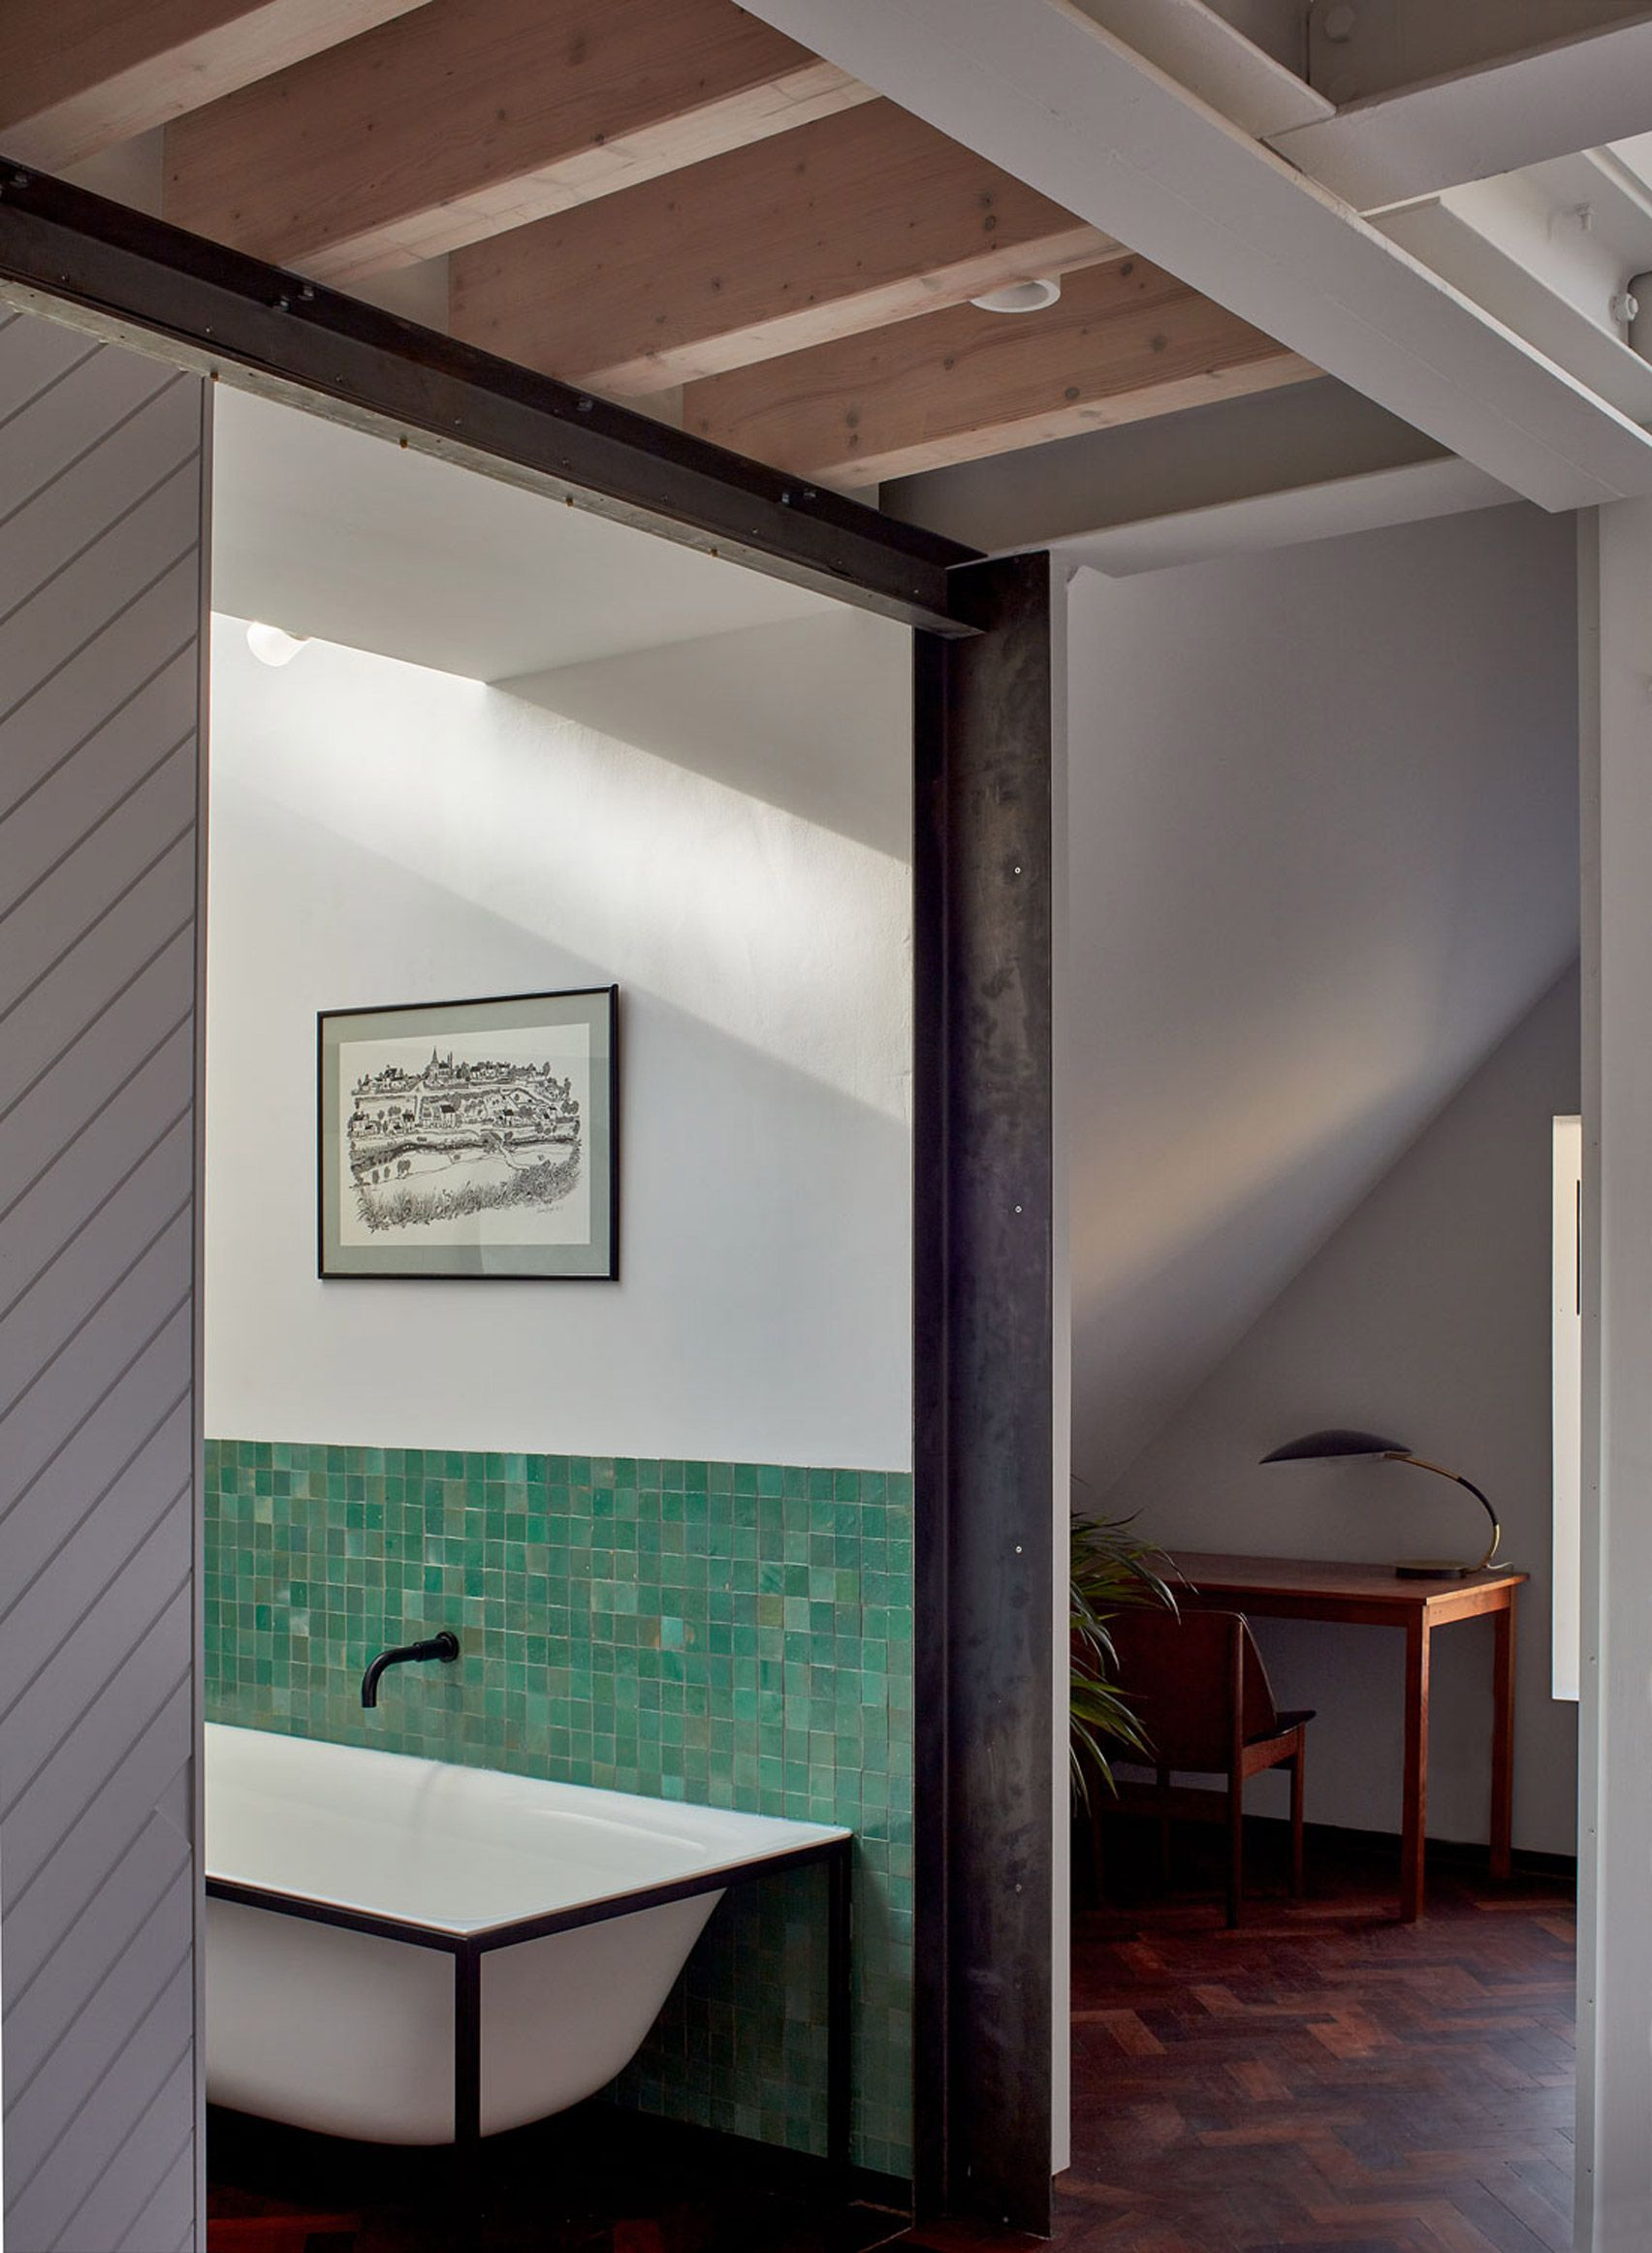 Liddicoat & Goldhill Squeezes Asymmetric Makers House Onto Narrow Plot